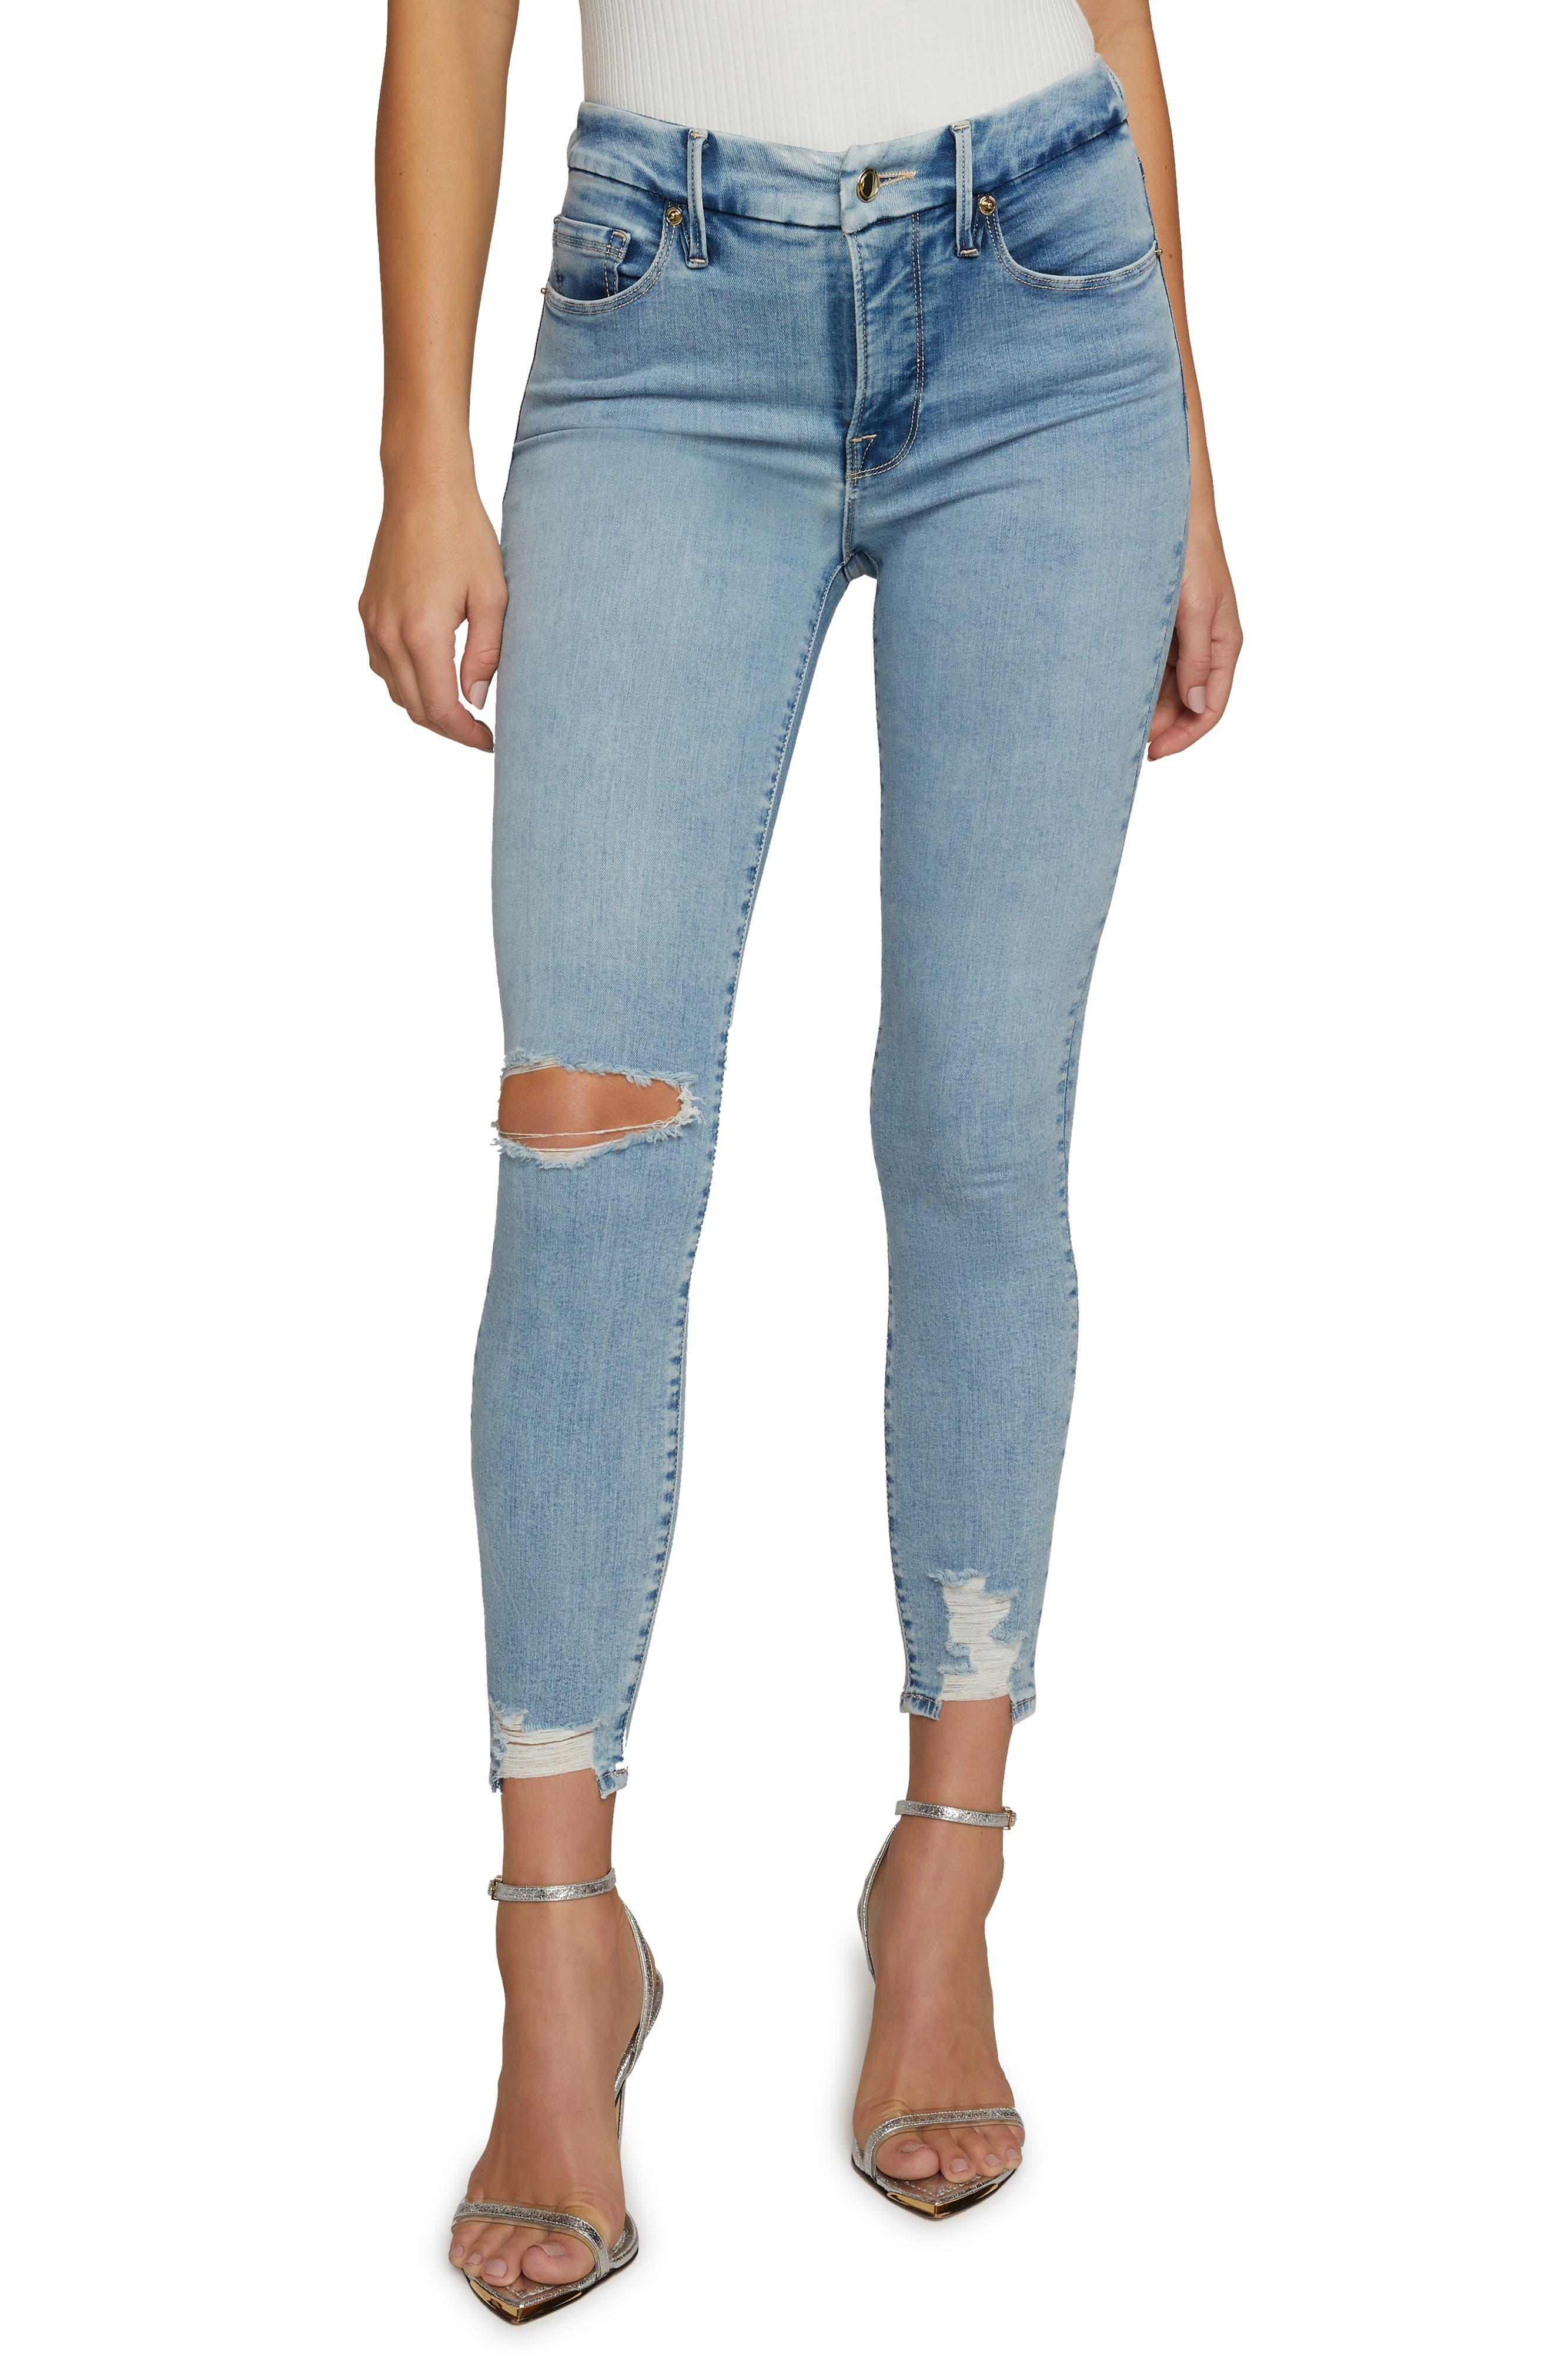 Women's Good American Good Legs Chewed Hem Skinny Jeans